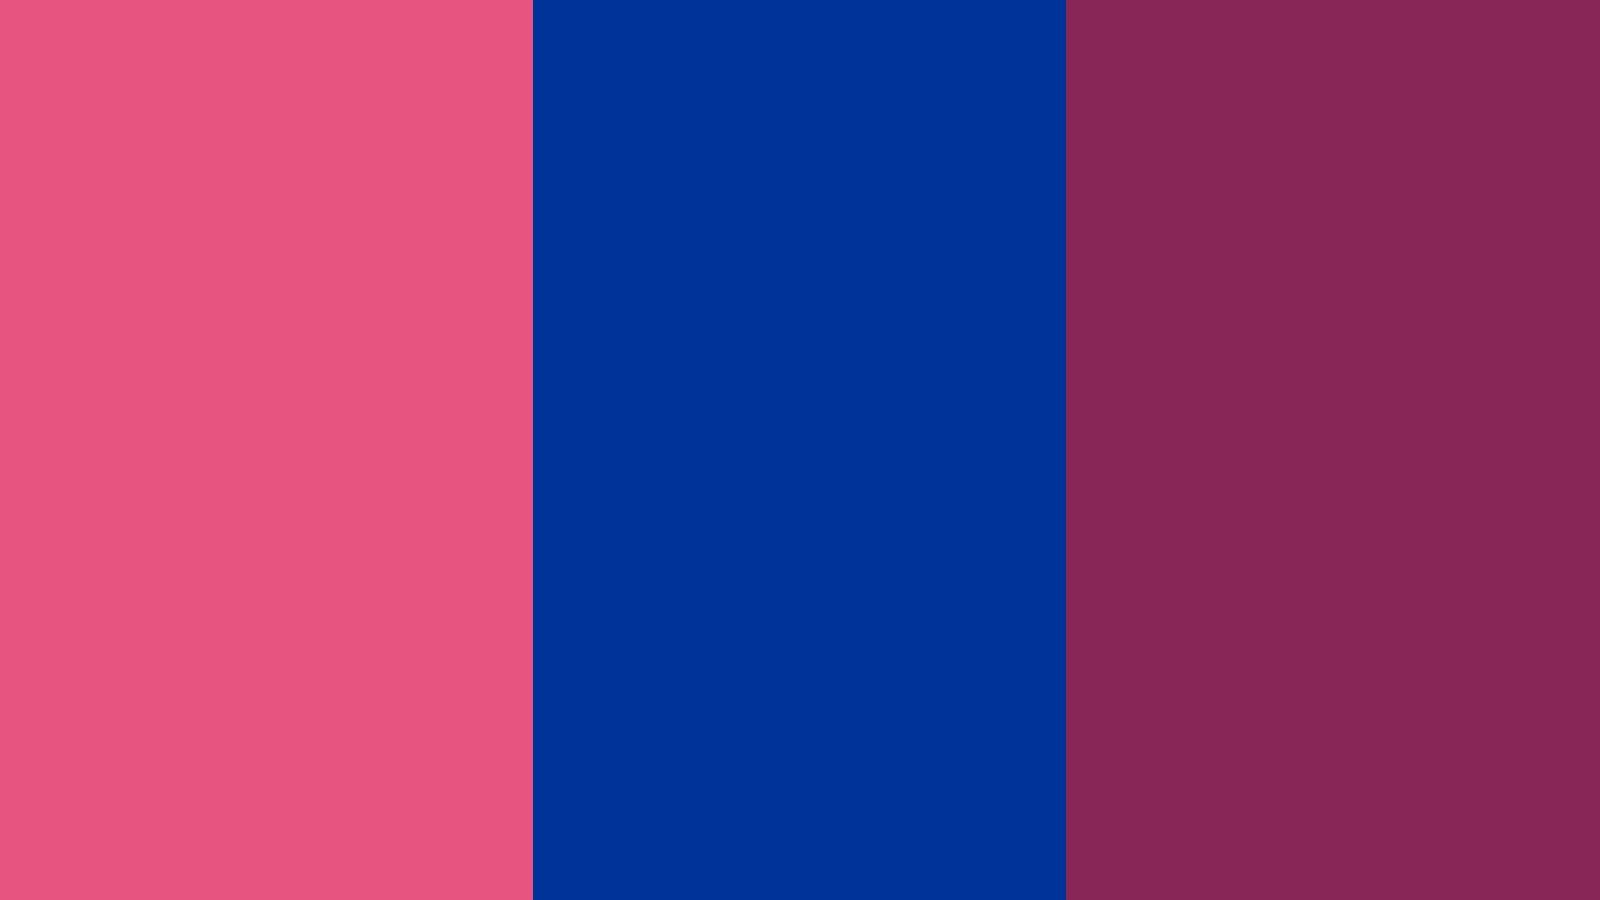 Color Pink Background  WallpaperSafari